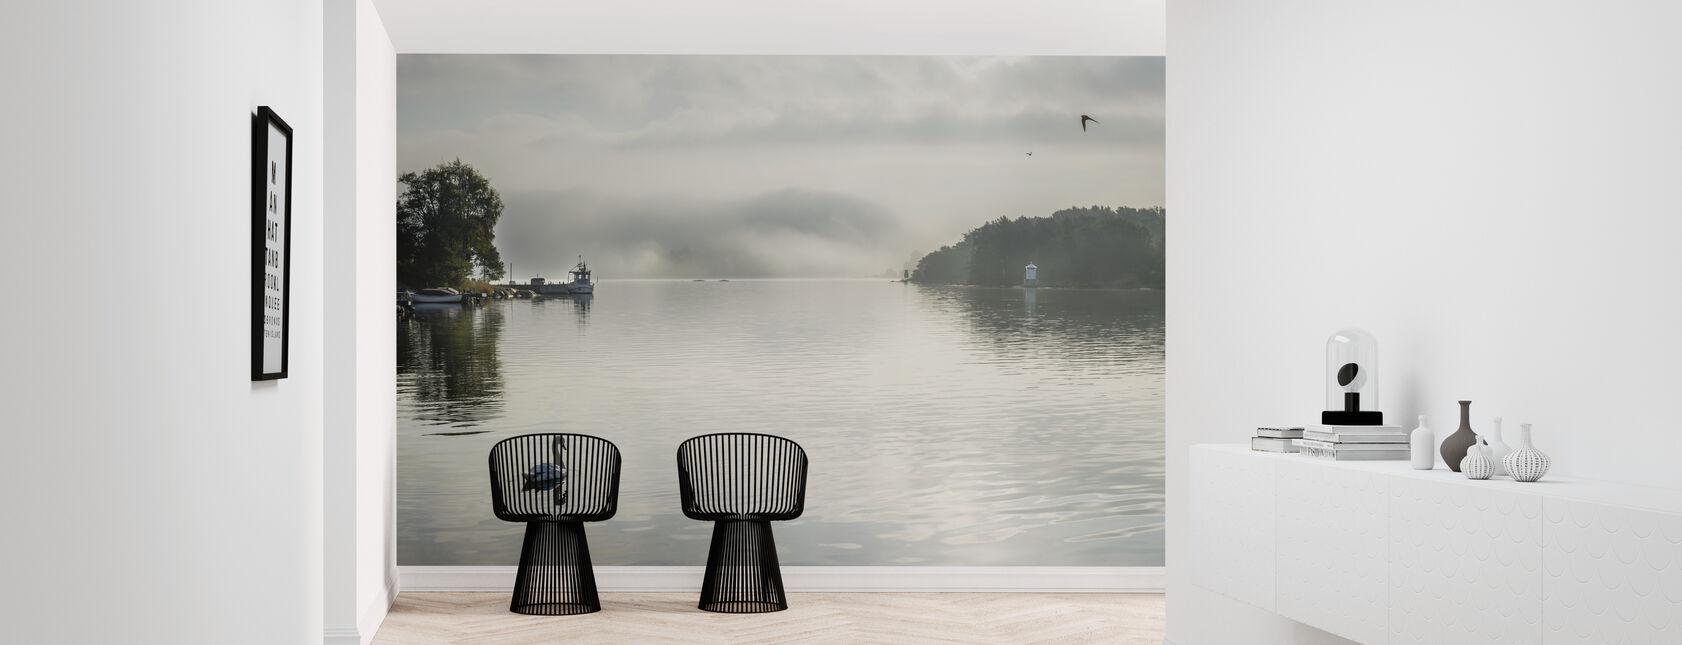 Mute Swan - Wallpaper - Hallway